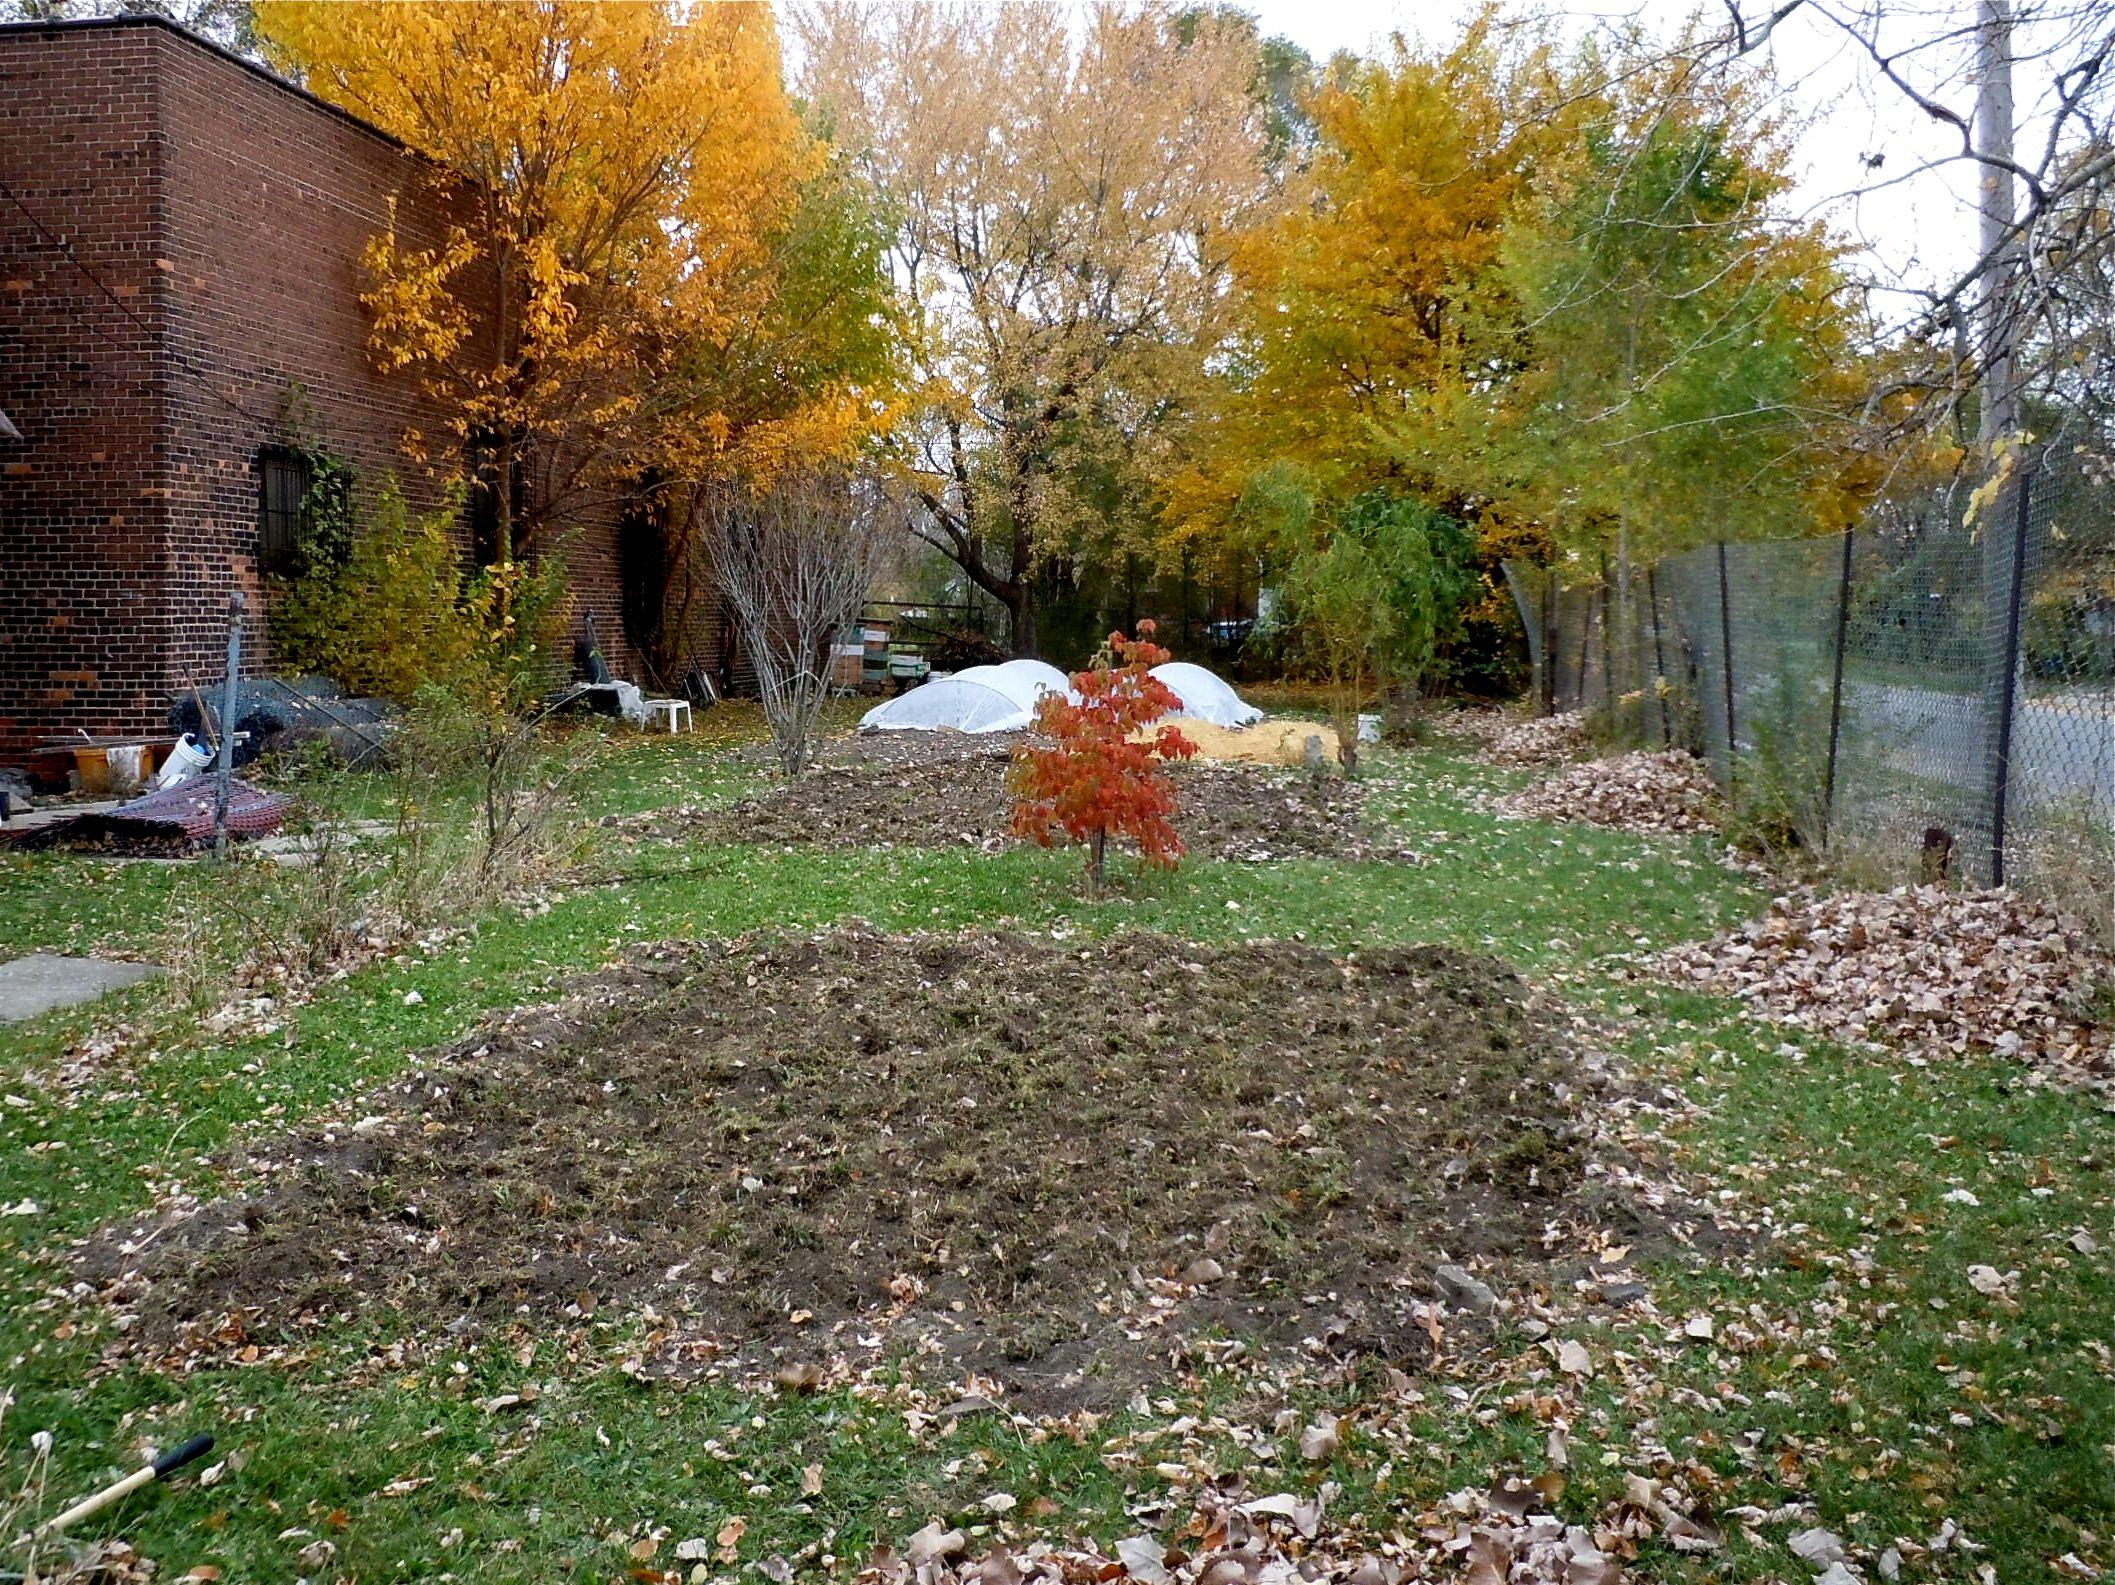 expanding the garden | little house on the urban prairie